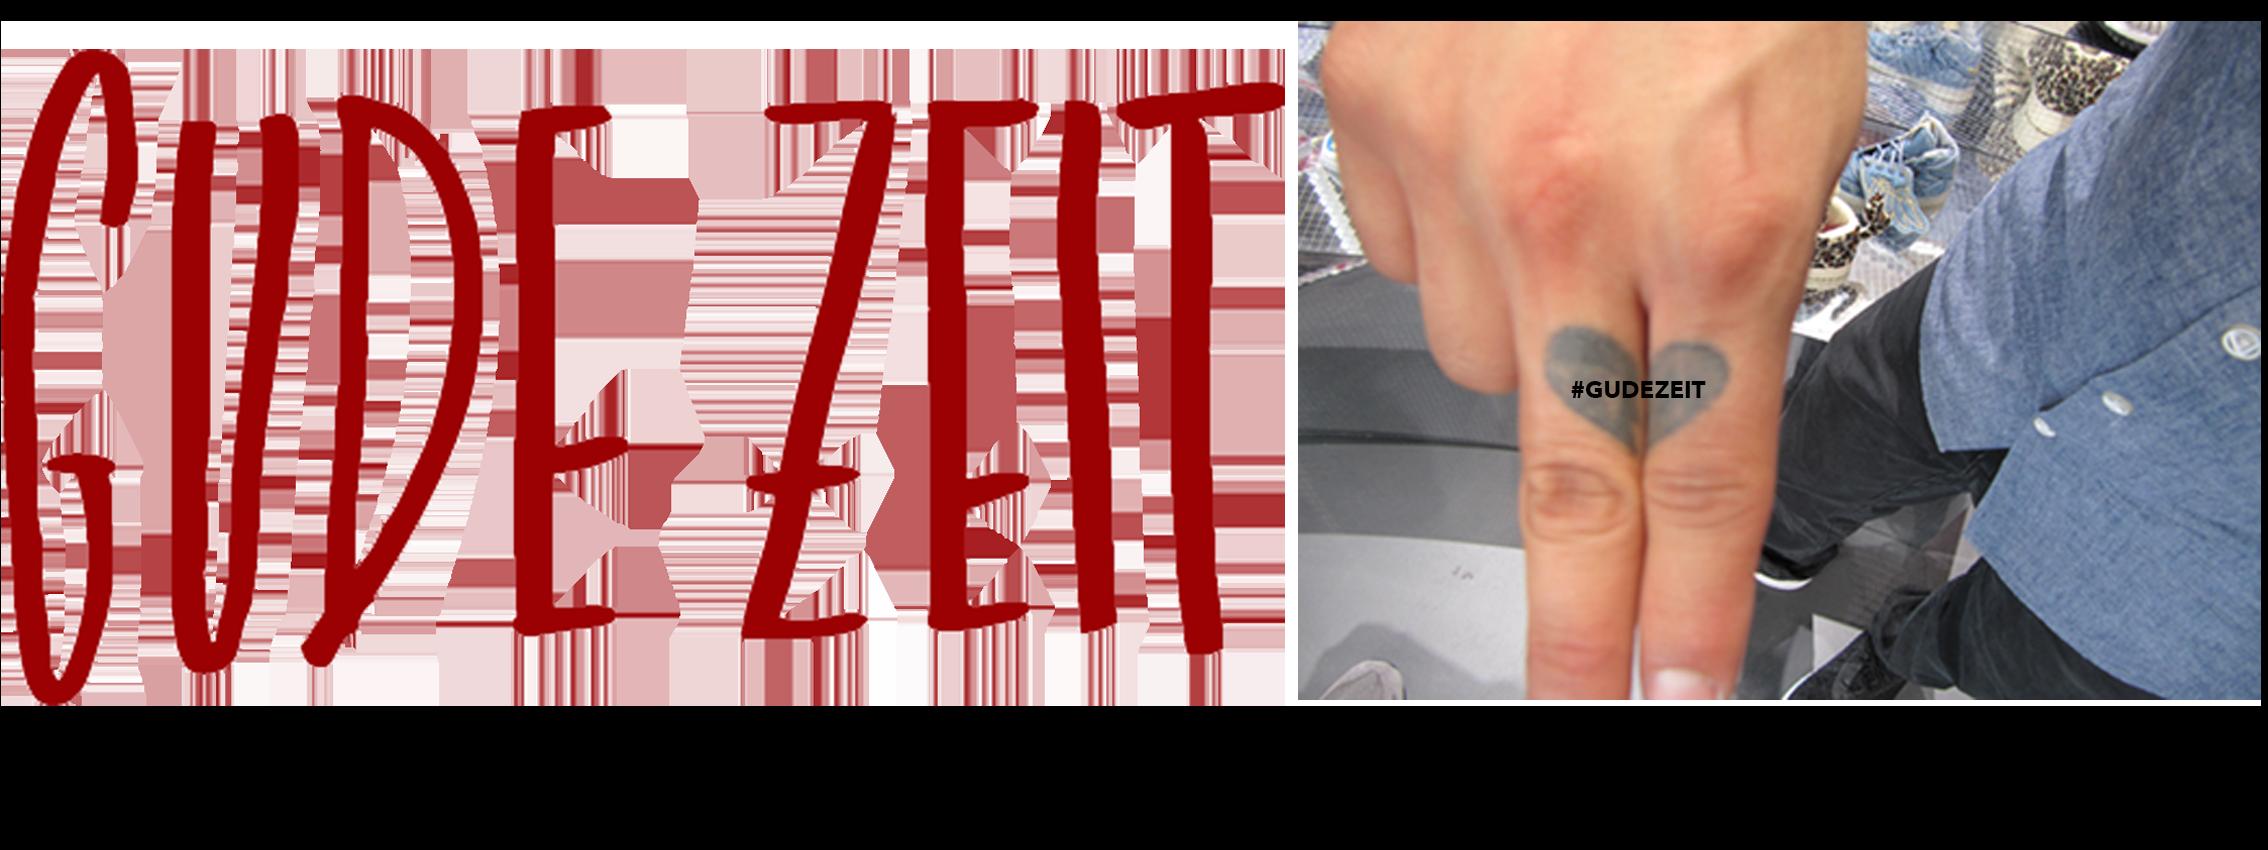 GUDE ZEIT